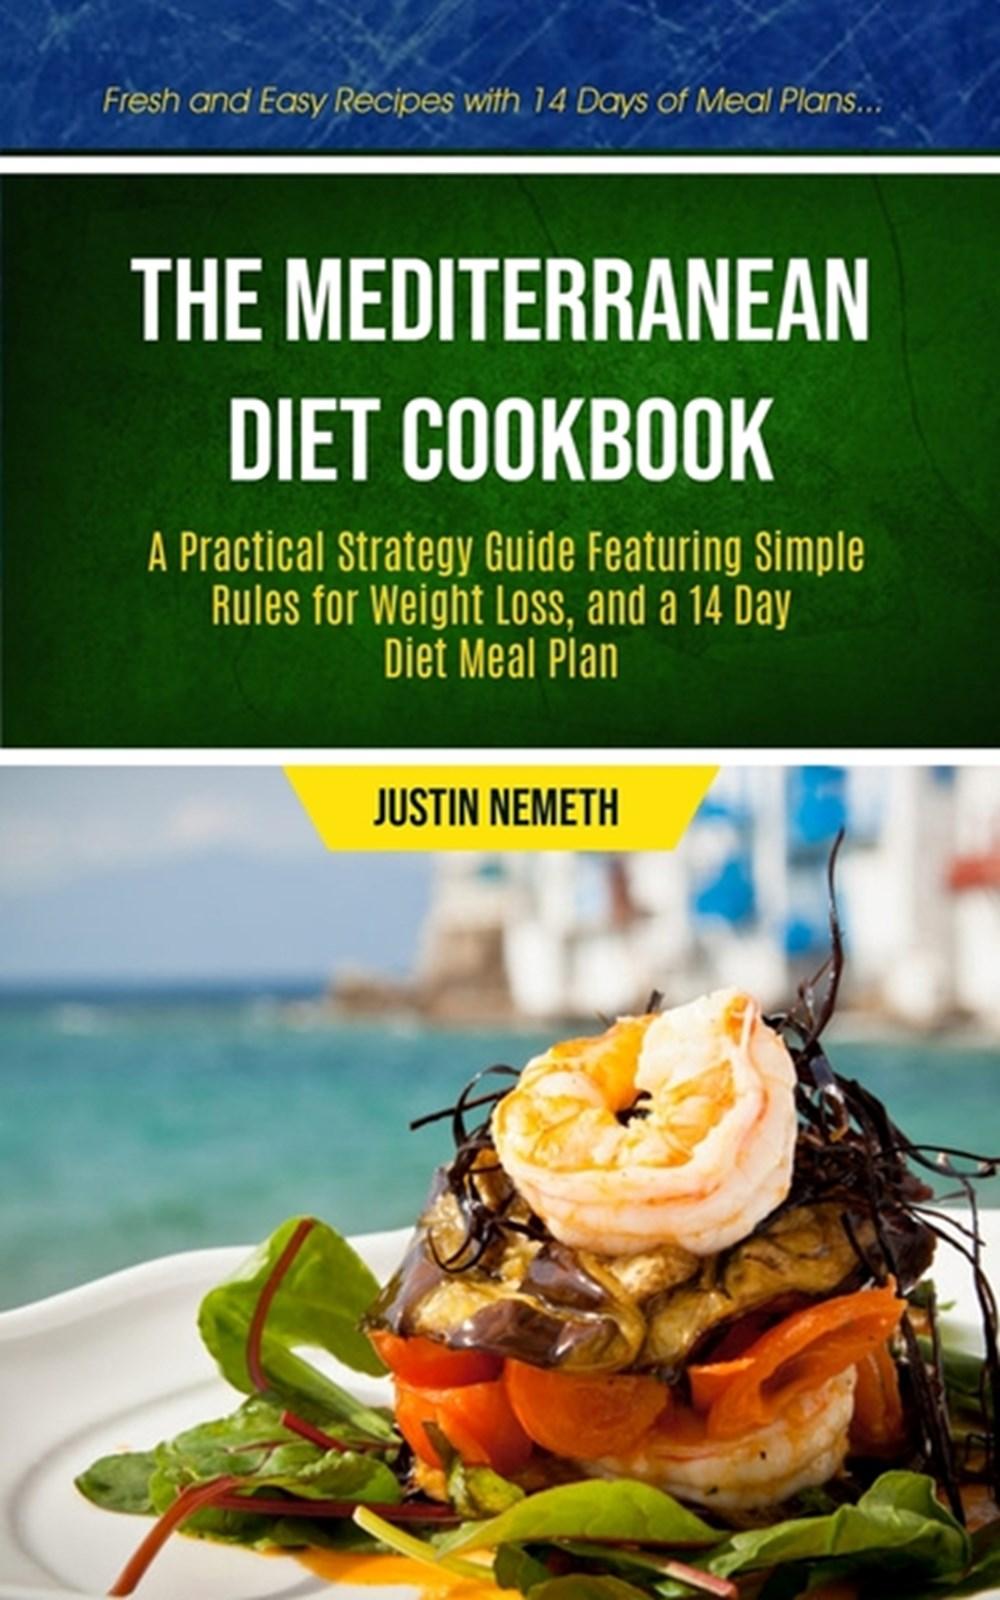 The Mediterranean Diet Cookbook: A Practical Strategy